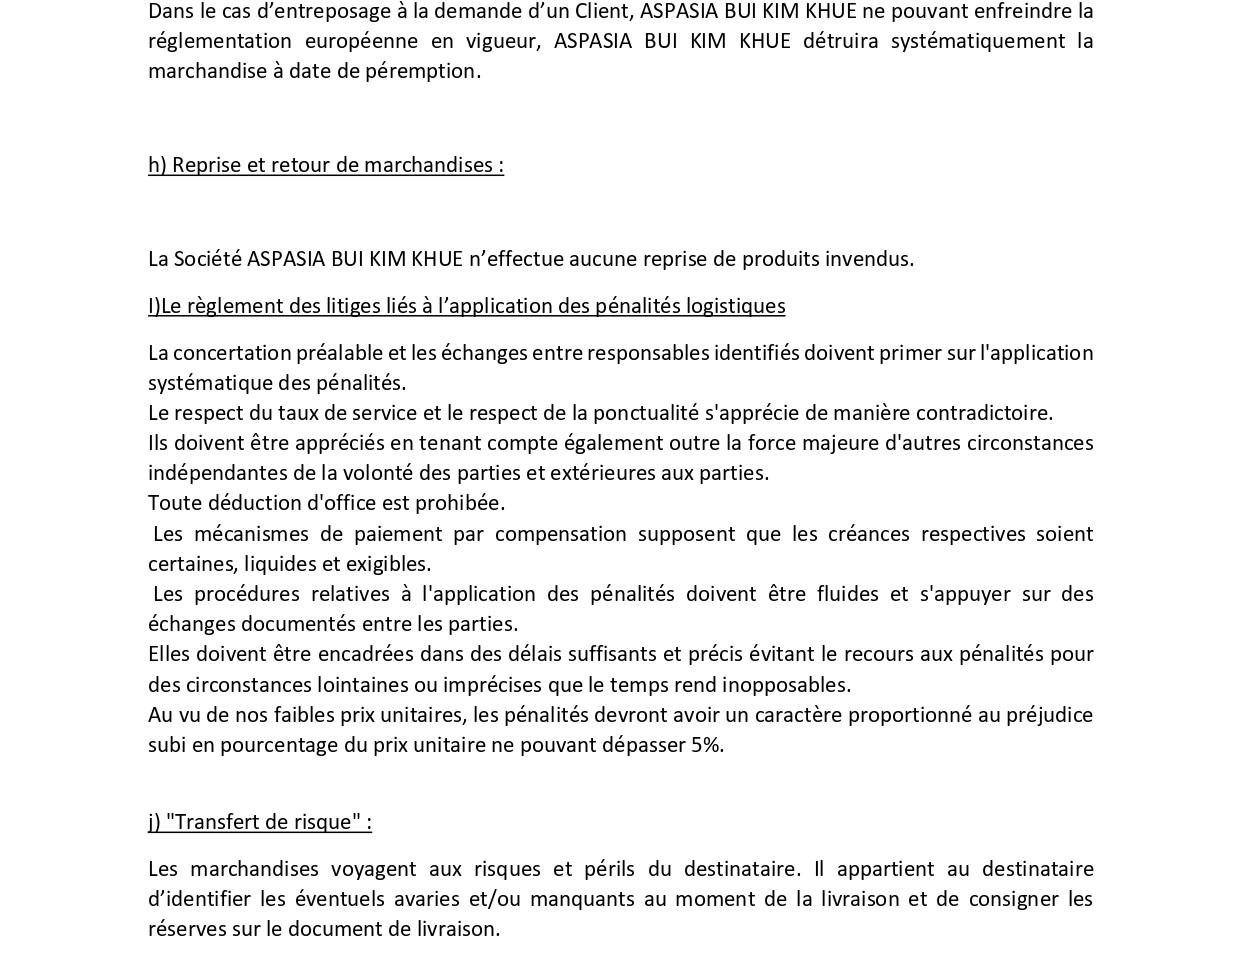 CGV ASPASIA 2020_page-0009.jpg